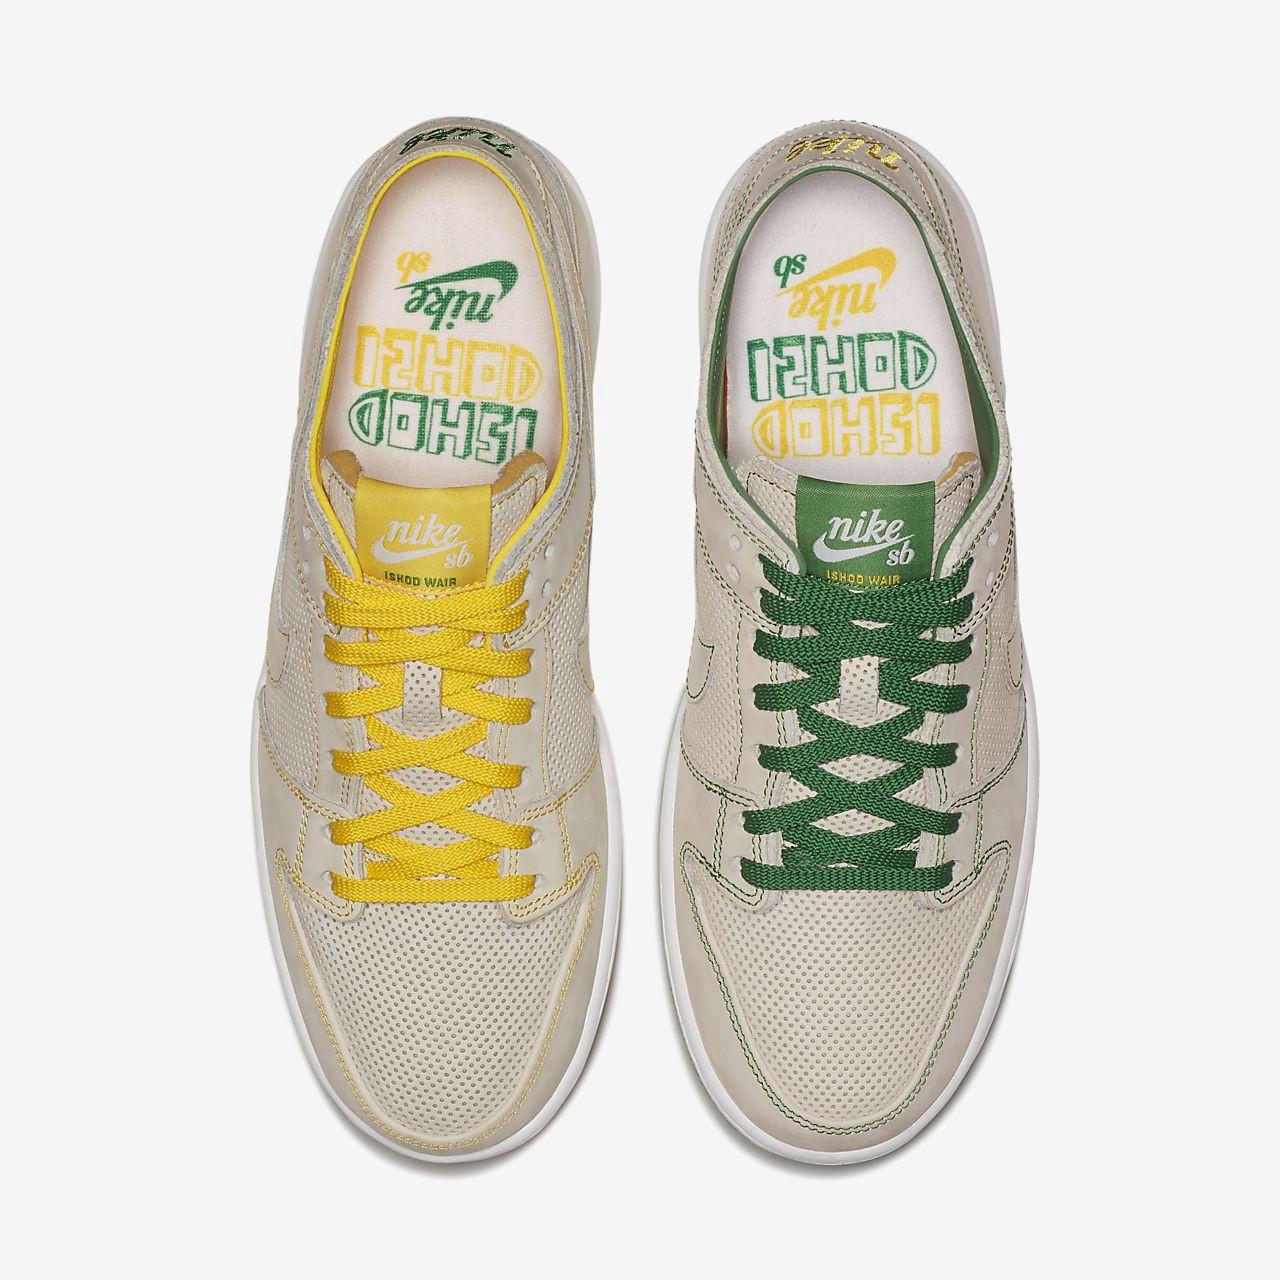 promo code 3b843 ef98a Nike Sb Zoom Dunk Low Pro Deconstructed Qs X Ishod Wair Men s Skateboarding  Shoe - 10.5